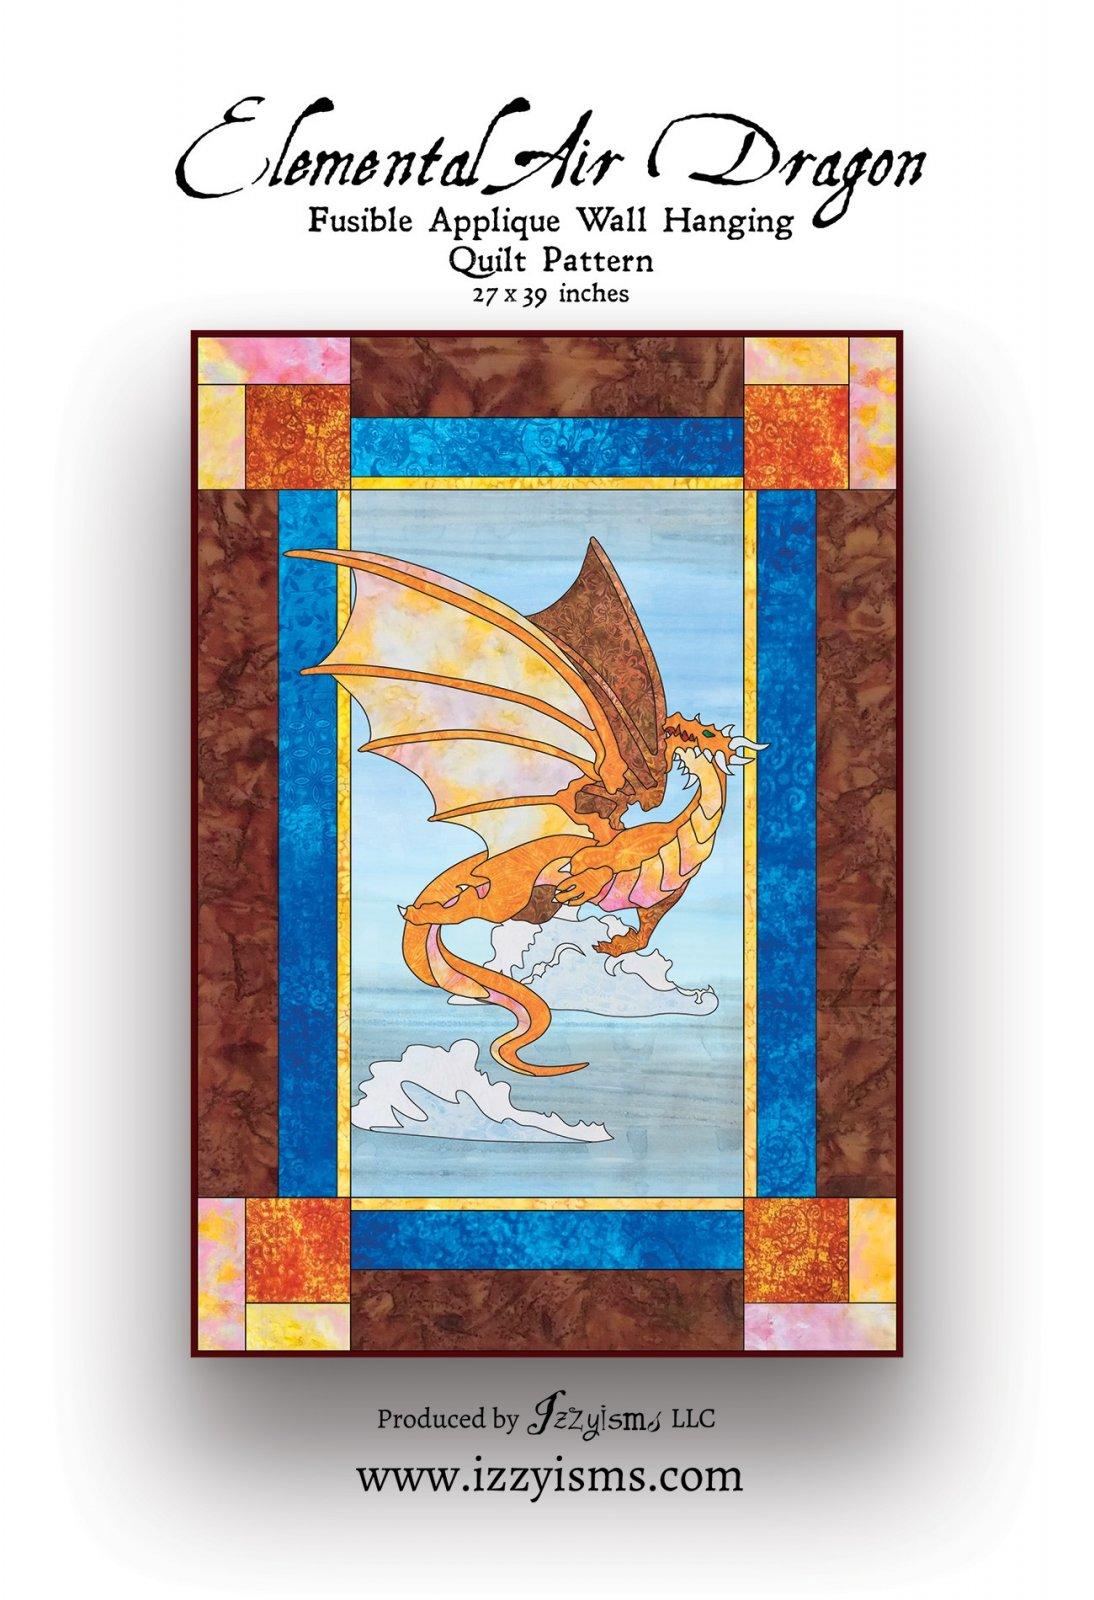 Elemental Air Dragon